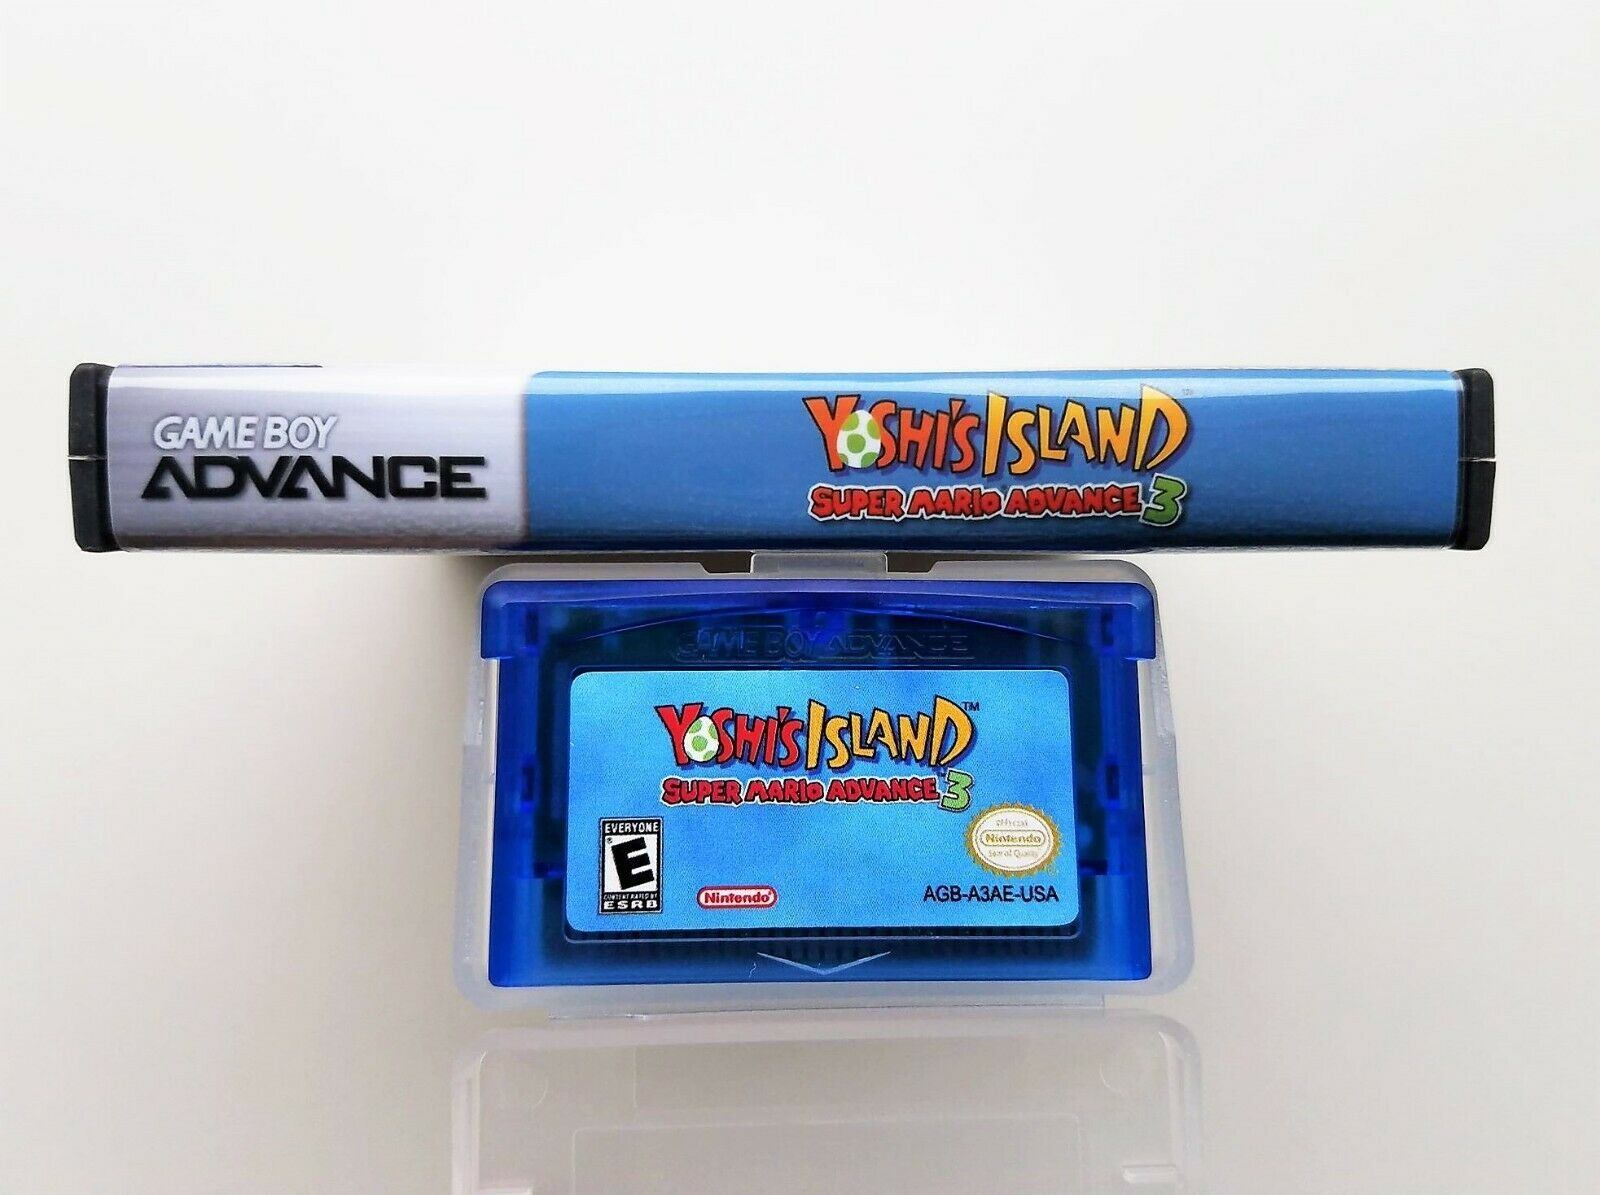 Yoshi's Island Super Mario World Advance 3 - Nintendo Game Boy Advance GBA (USA) image 4